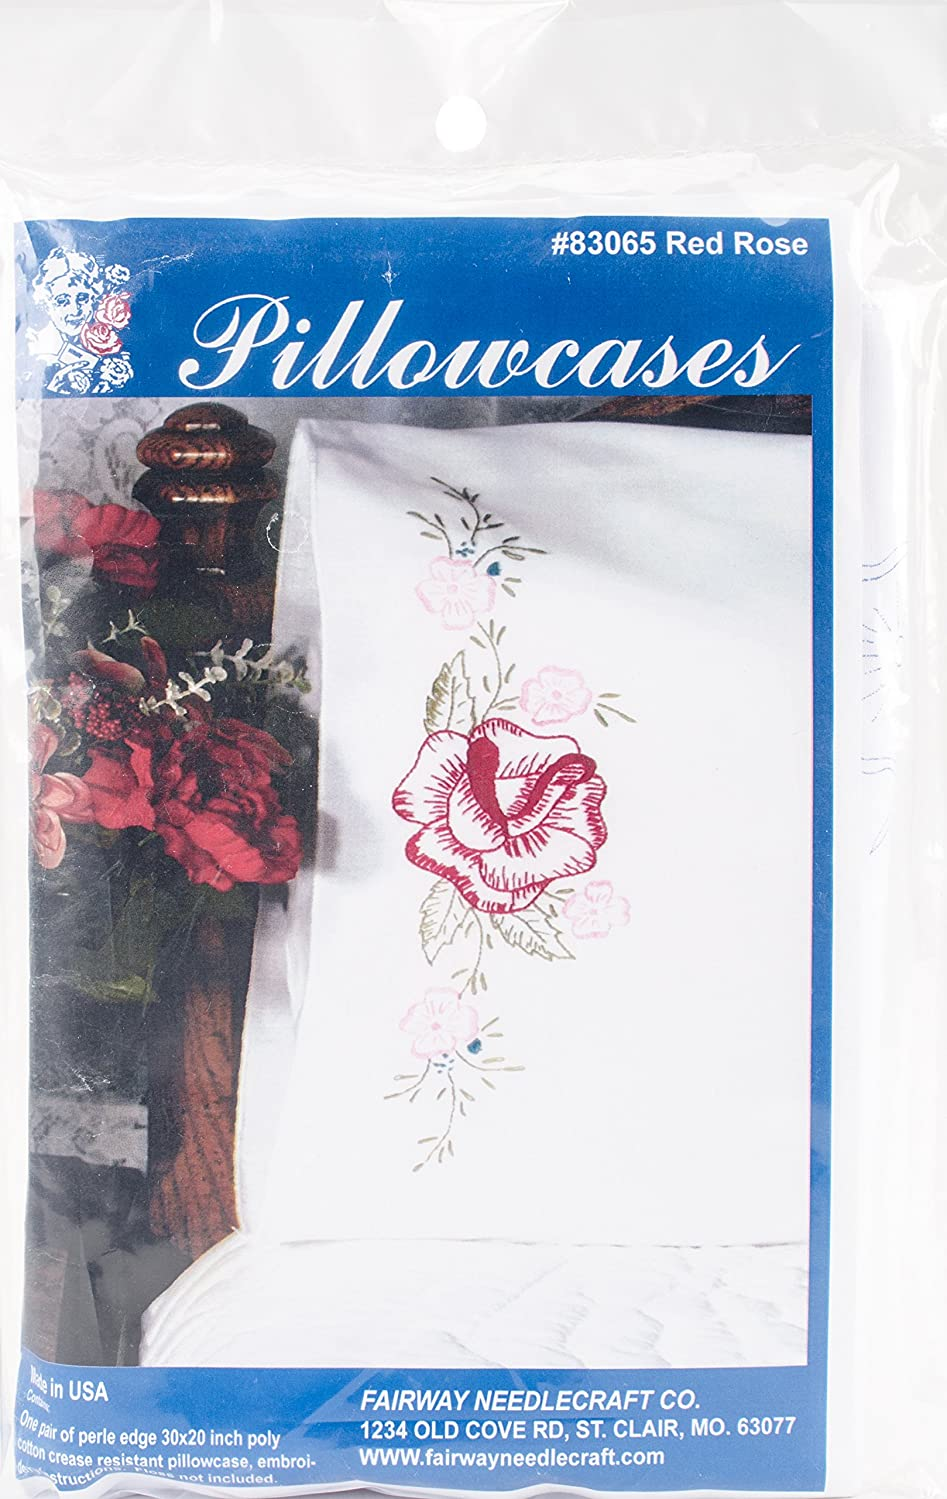 Fairway Needlecraft Red Rose Stamped Perle Edge Pillowcases 2/Pkg, 30